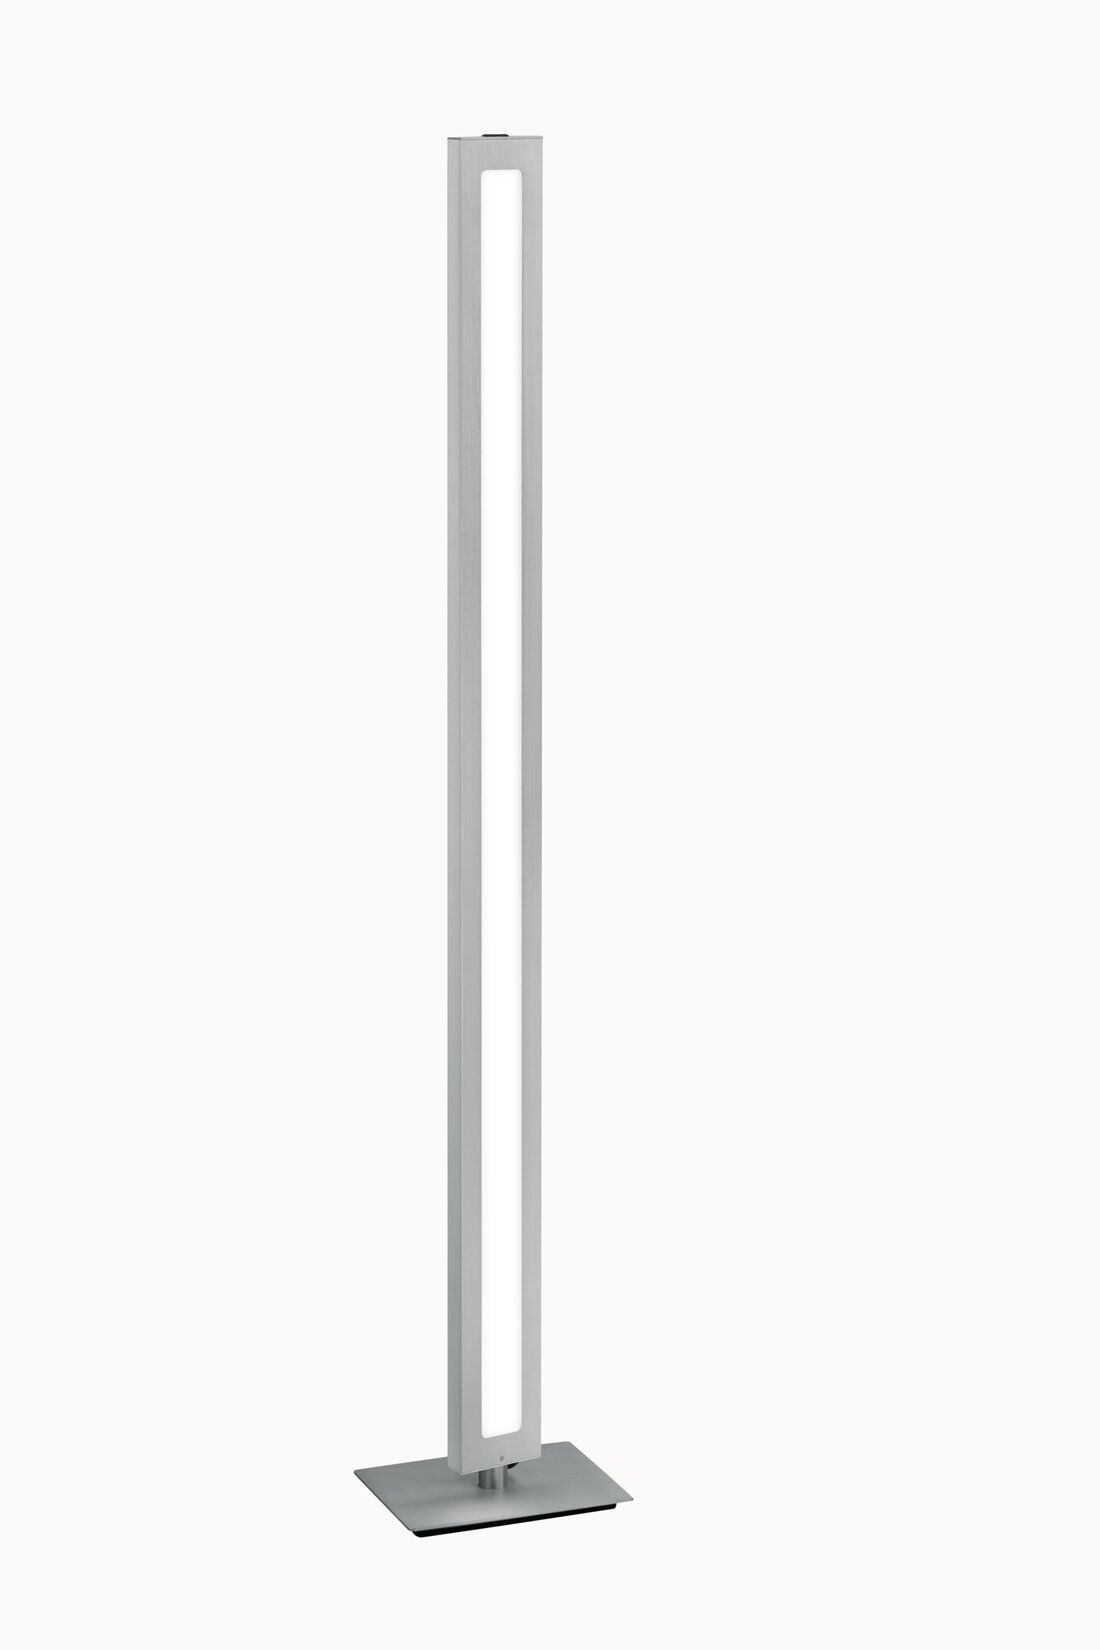 Metro Lane 116cm Led Spezial Stehlampe Tisch Wayfair De